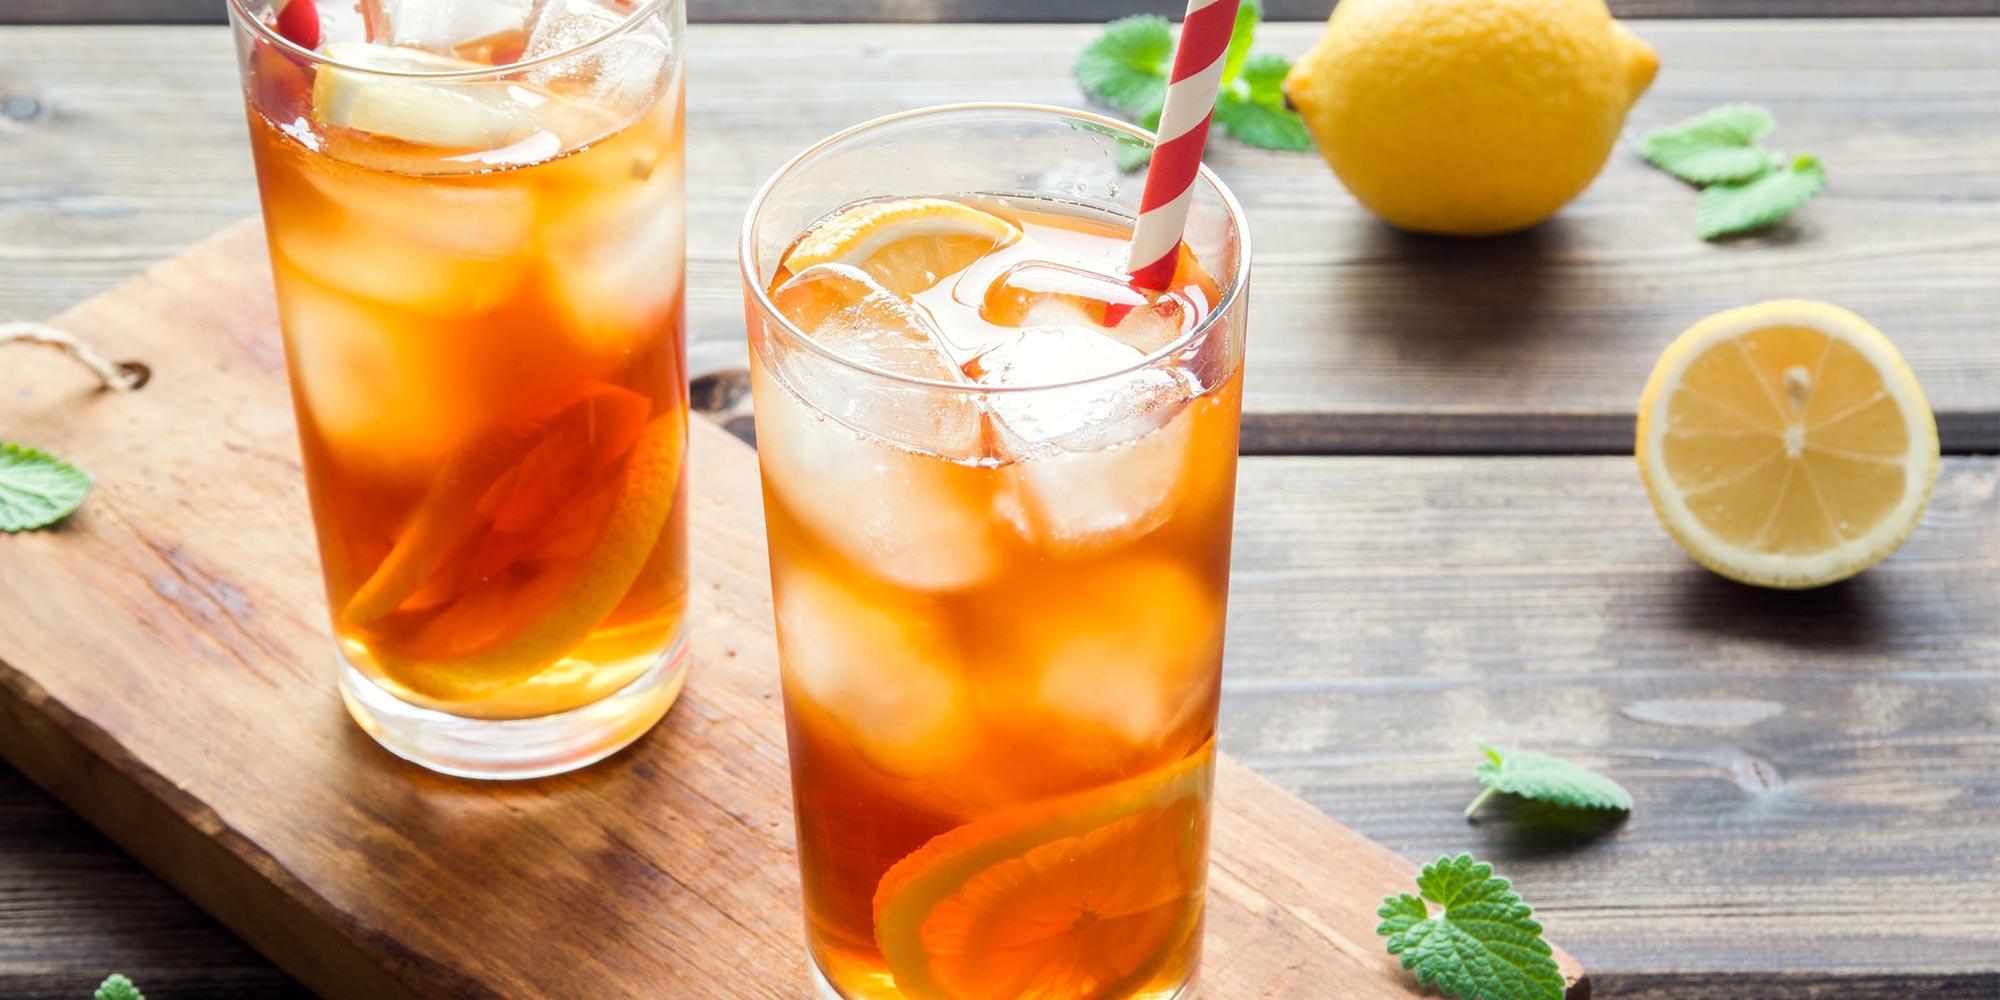 Low Sugar Long Island Iced Tea Recipe No Calorie Sweetener Sugar Substitute Splenda Sweeteners